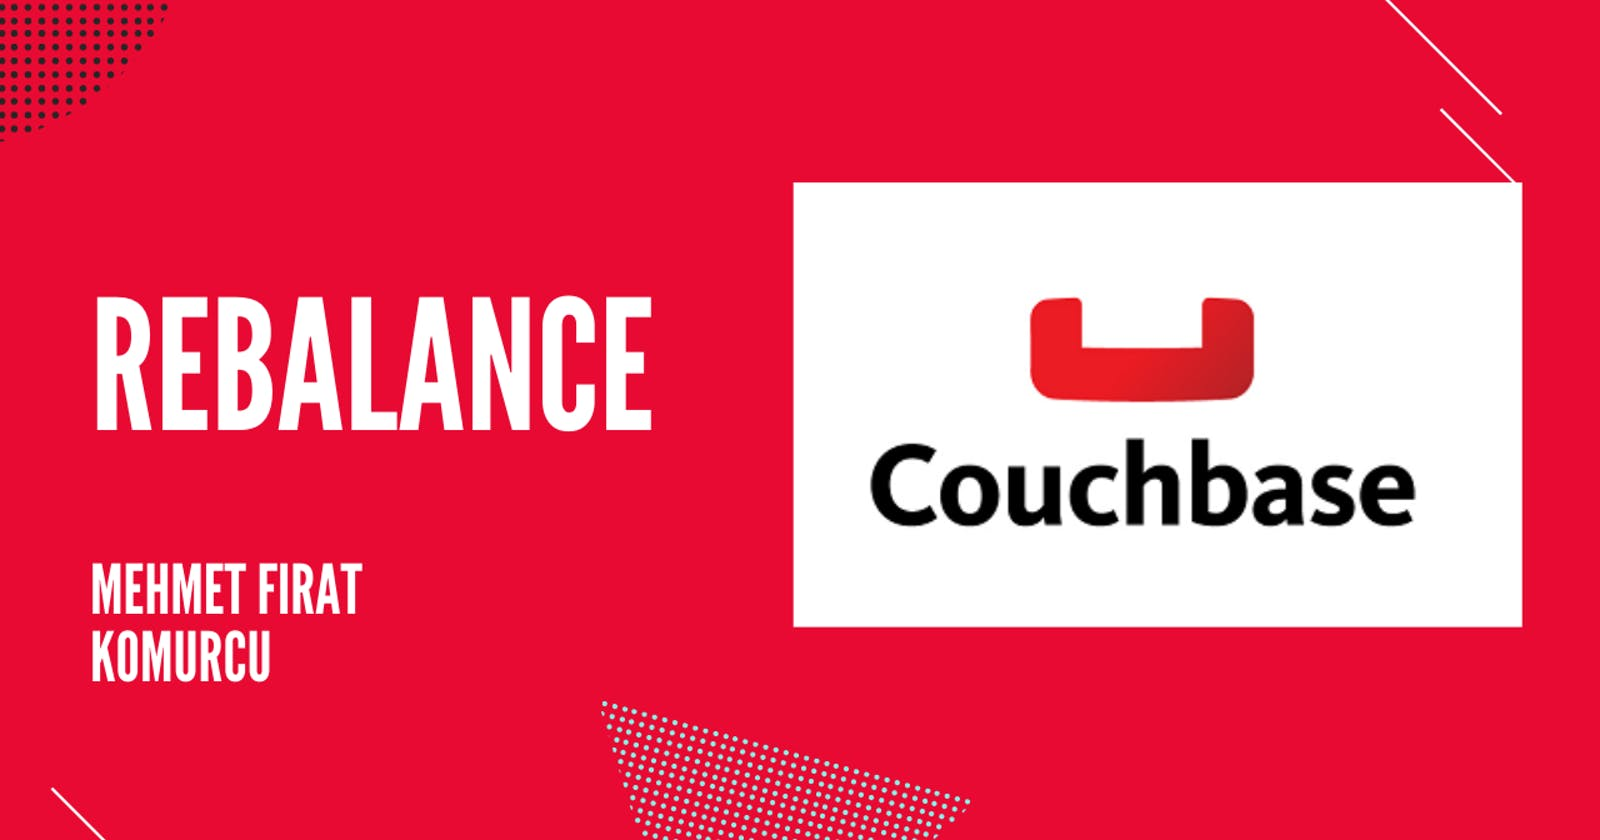 Couchbase: Rebalance